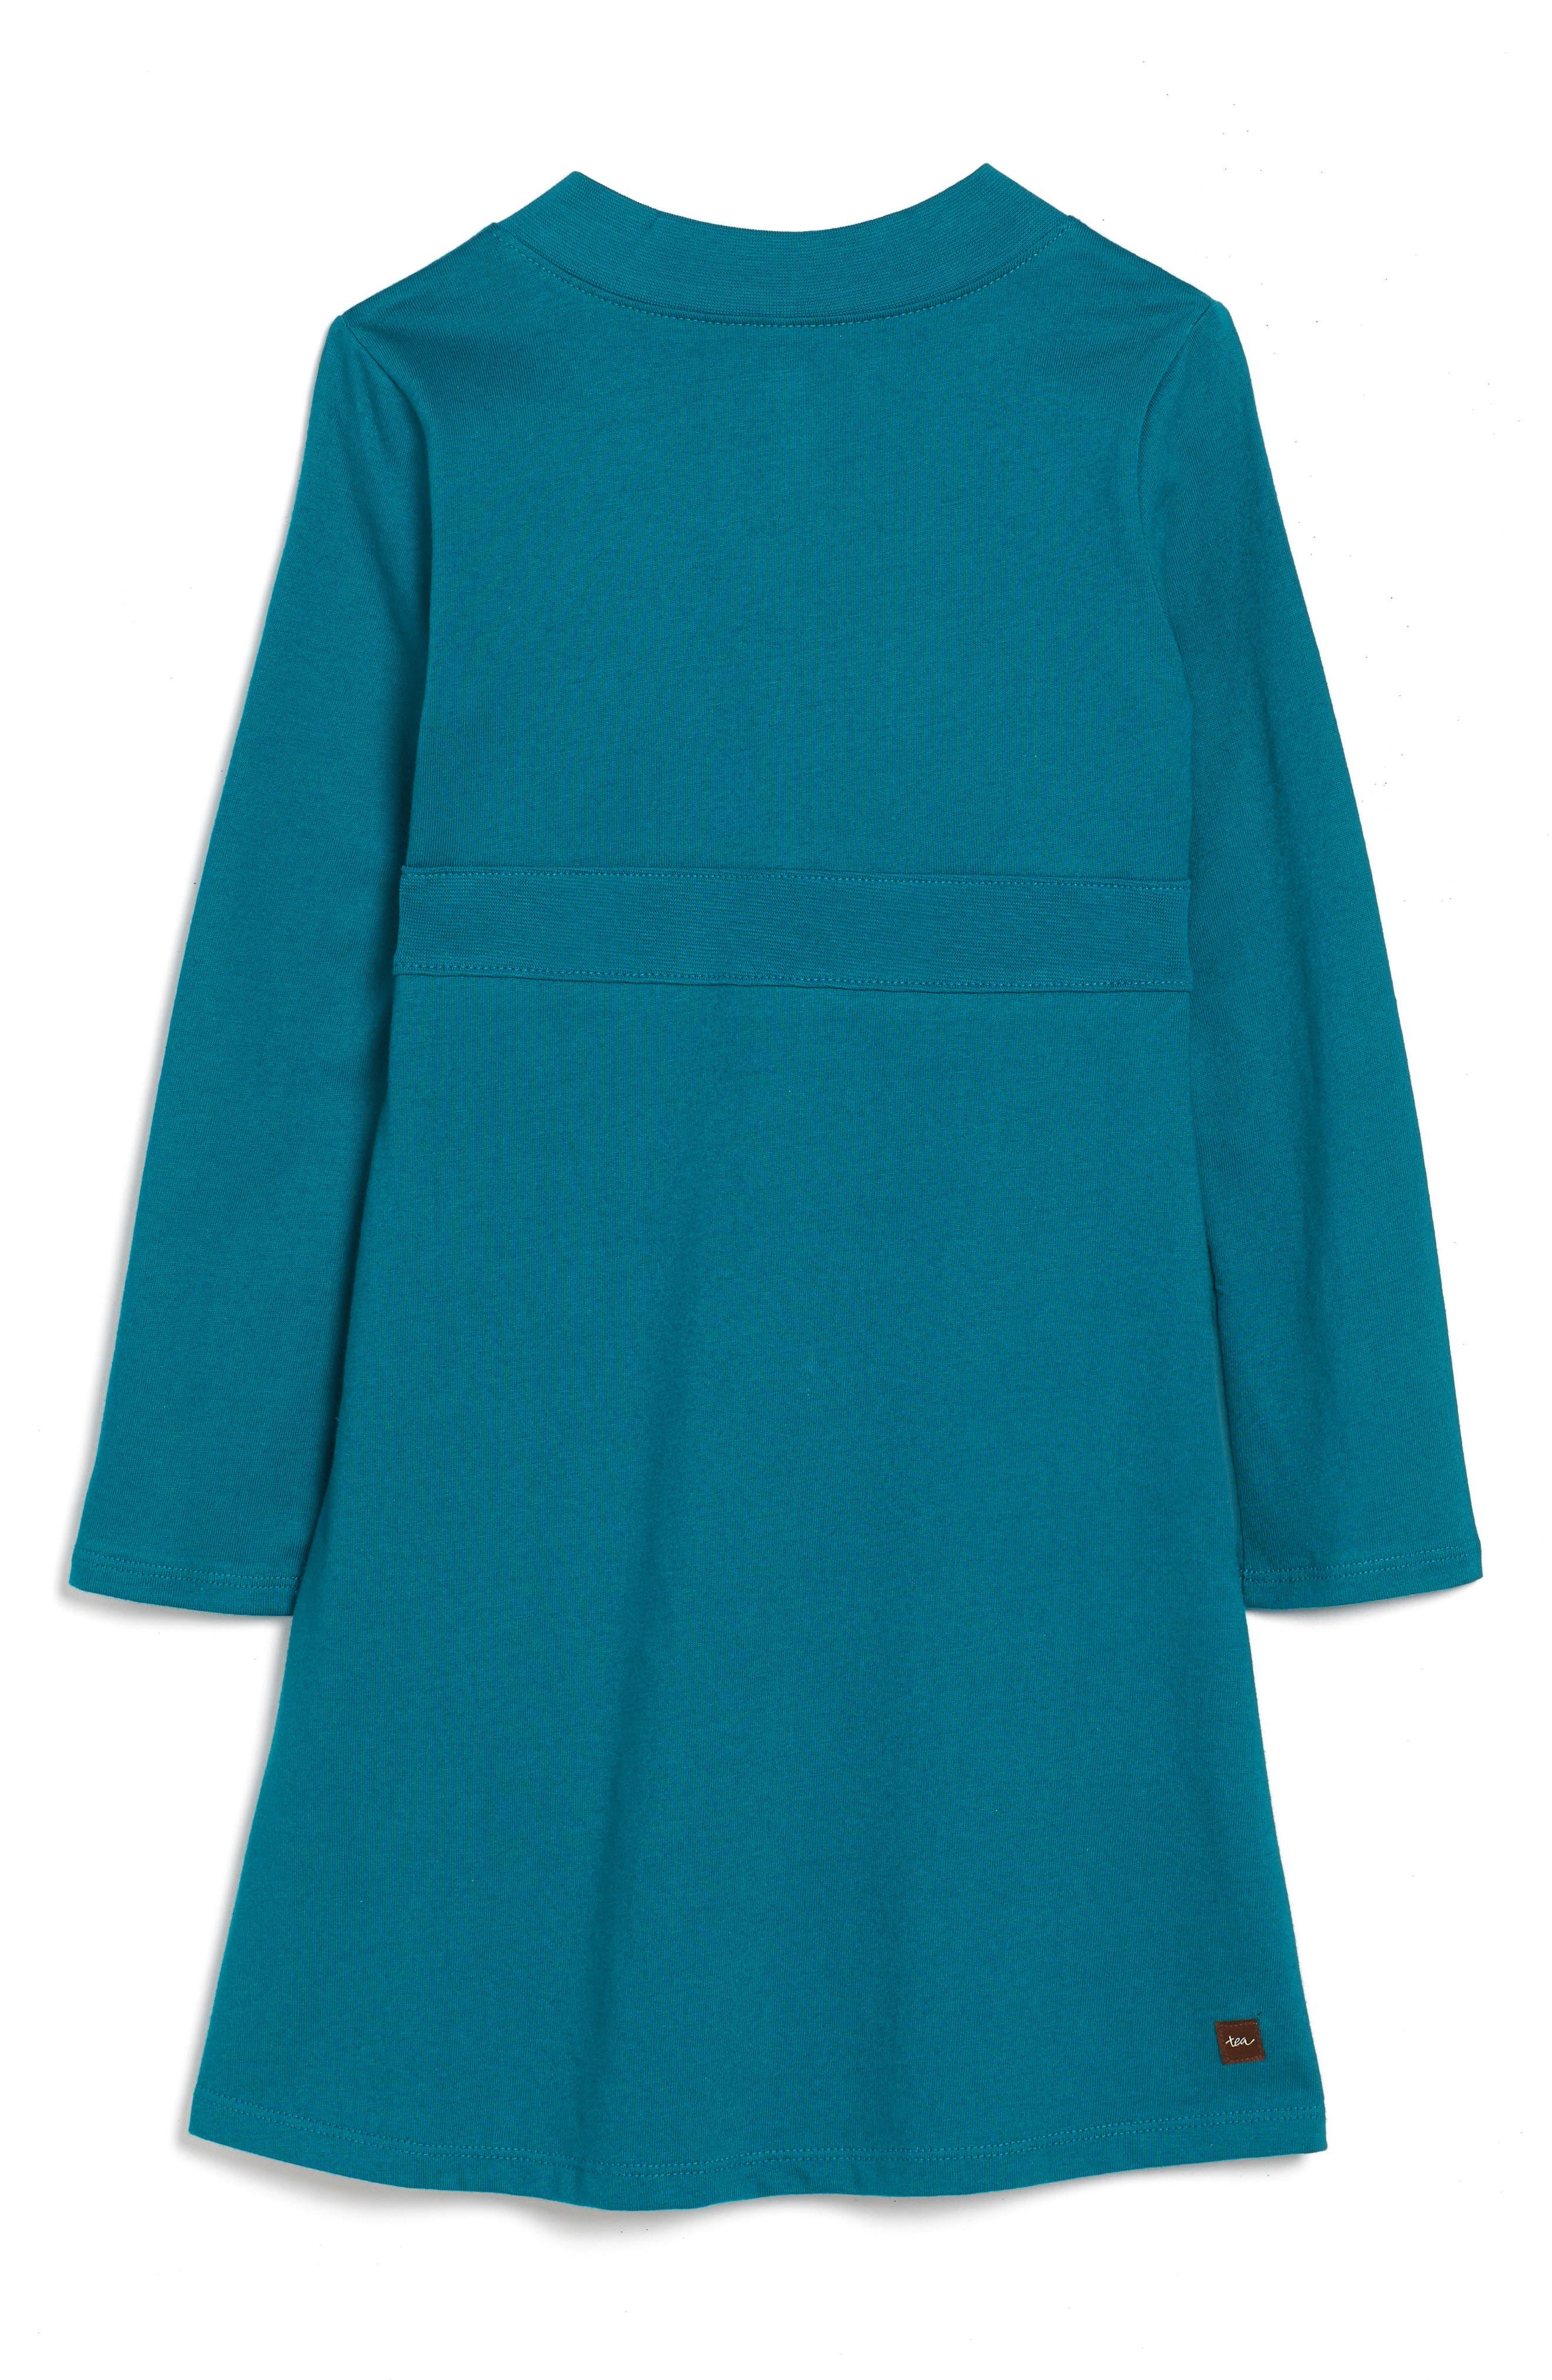 Ingram Street Print Wrap Neck Dress,                             Alternate thumbnail 2, color,                             443